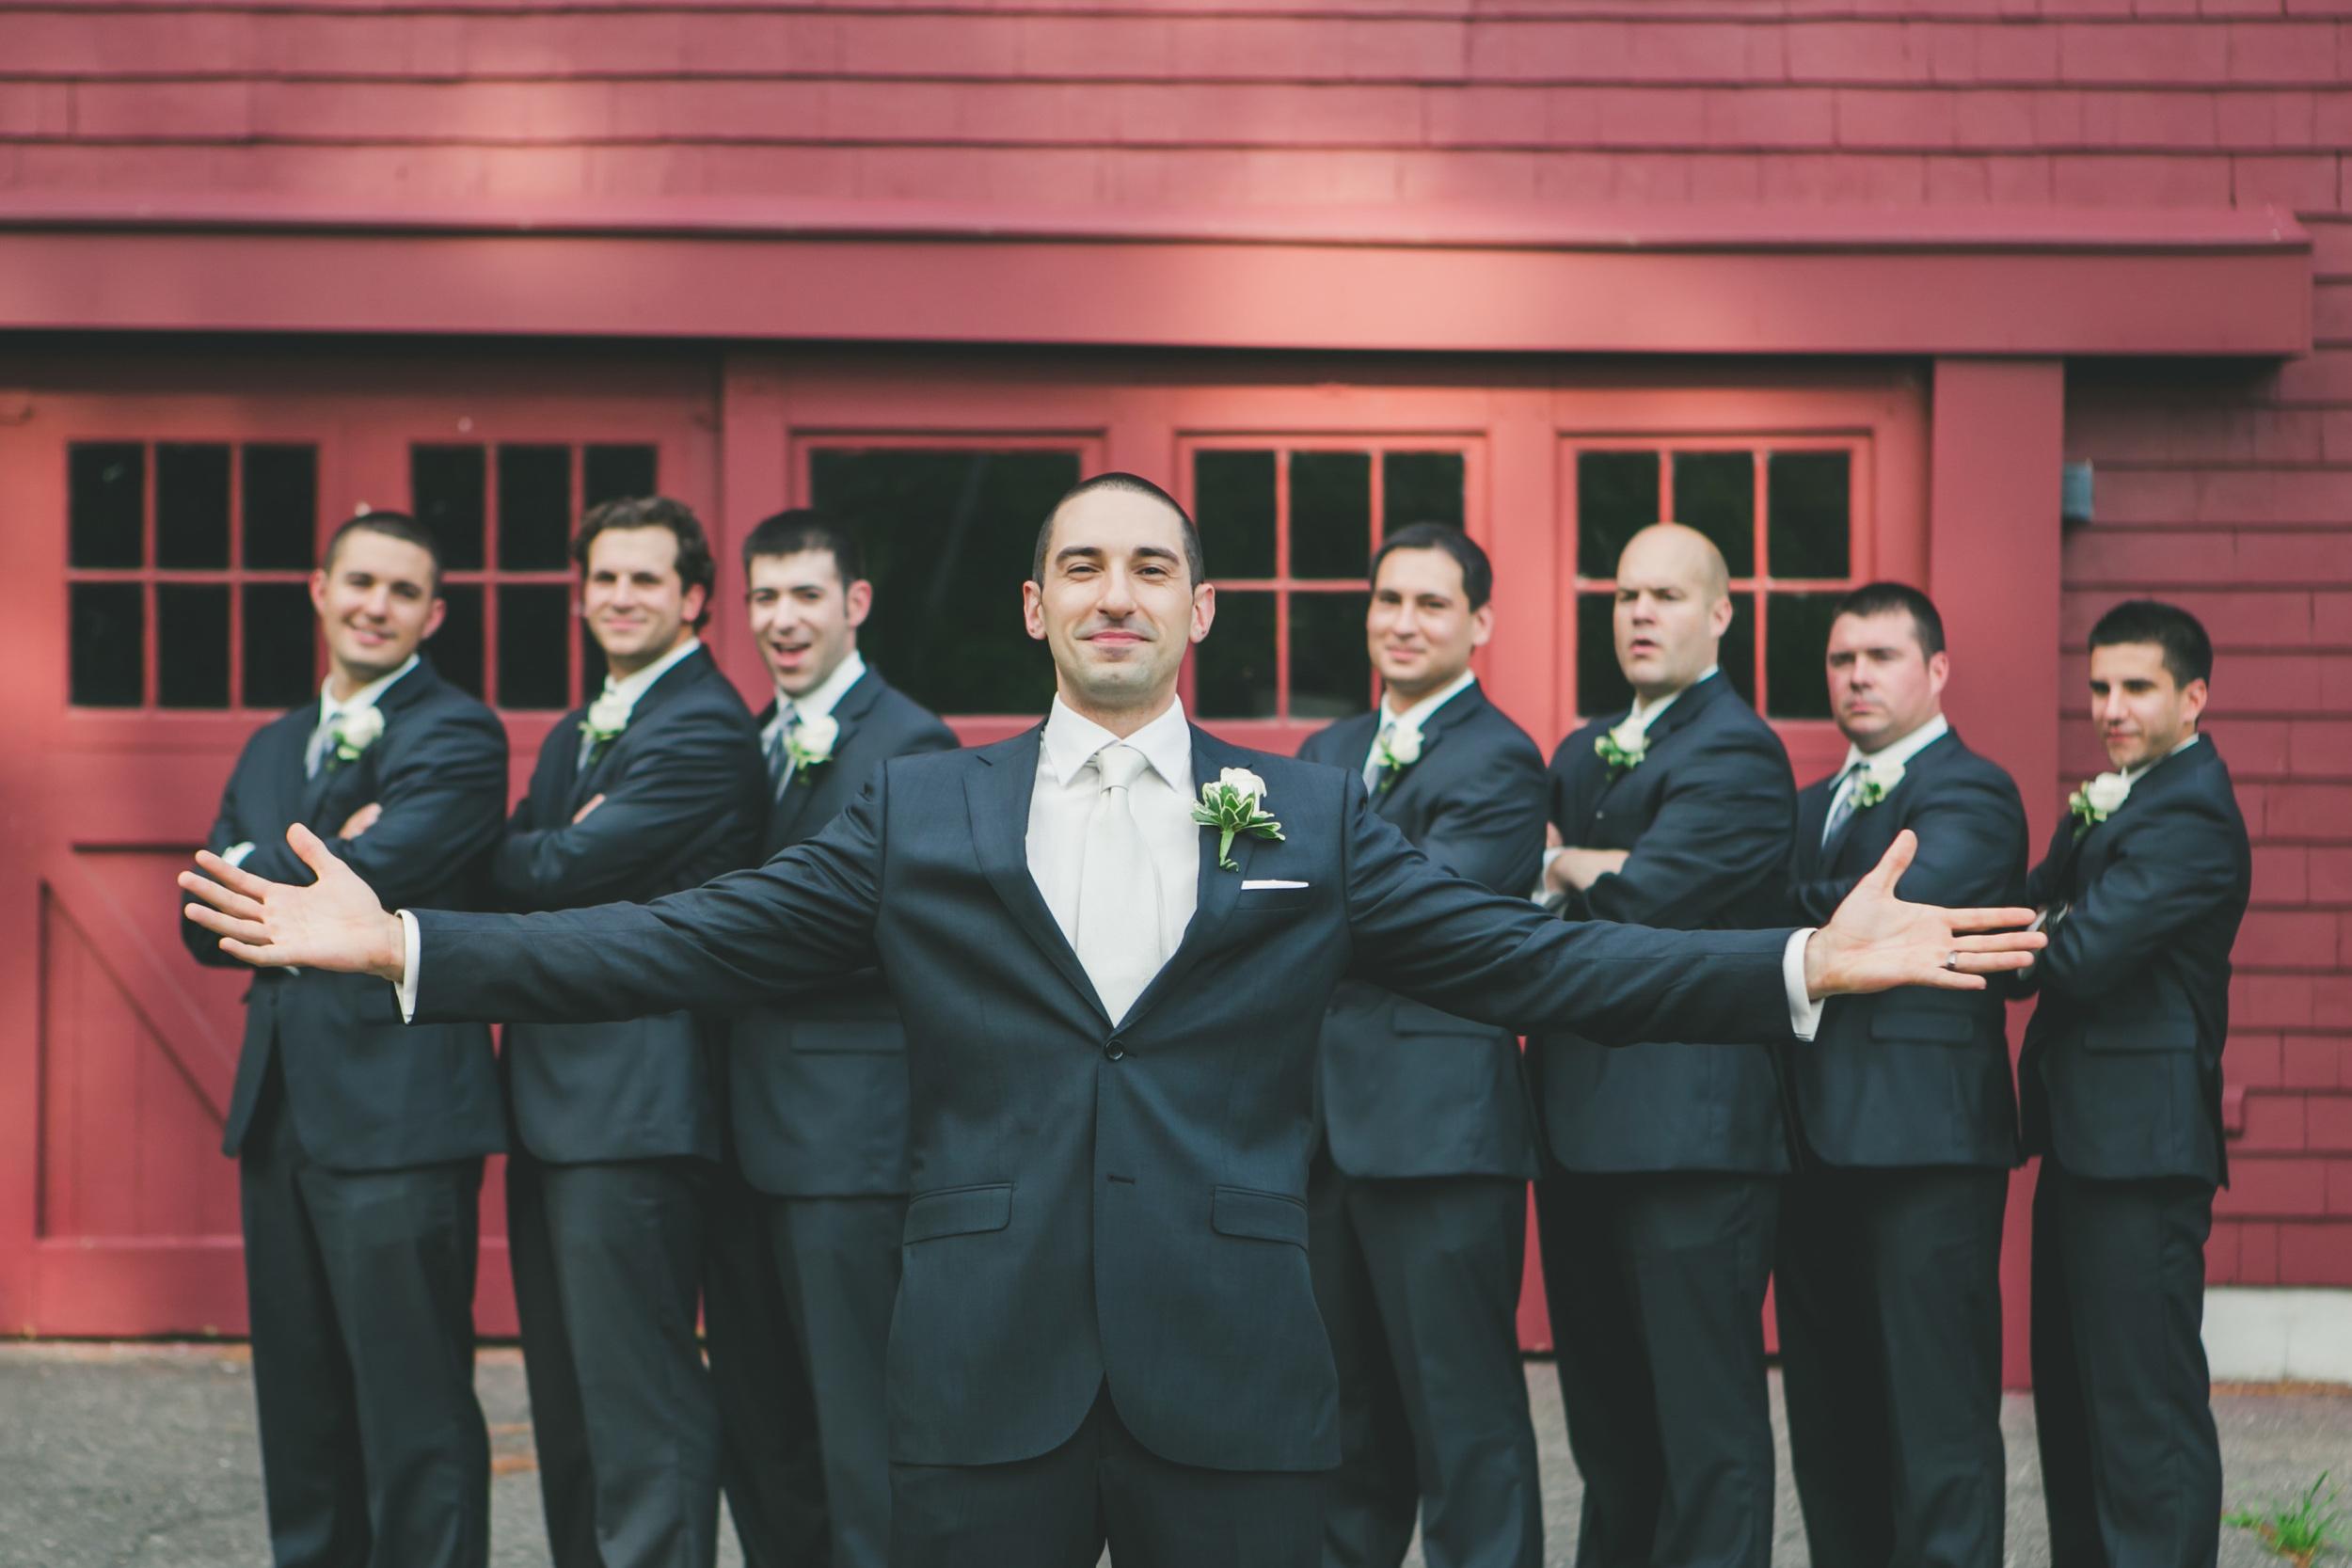 Romatic-Polish-American-Wedding-Riverview-Connecticut-Jacek-Dolata-Documentary-Wedding-Photography-10.jpg